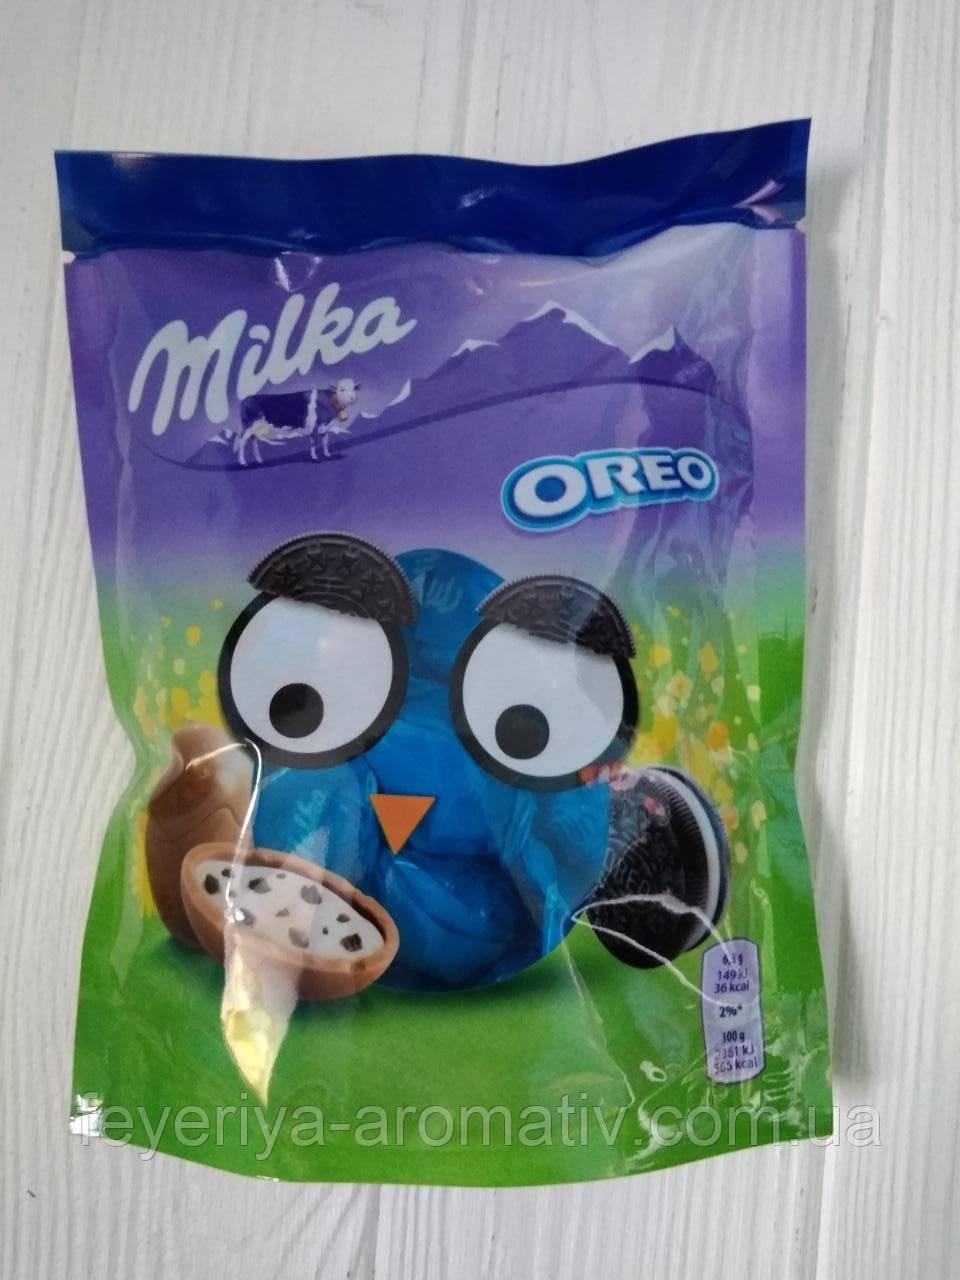 Конфеты Милка c орео Milka Oreo 86г (Швейцария)